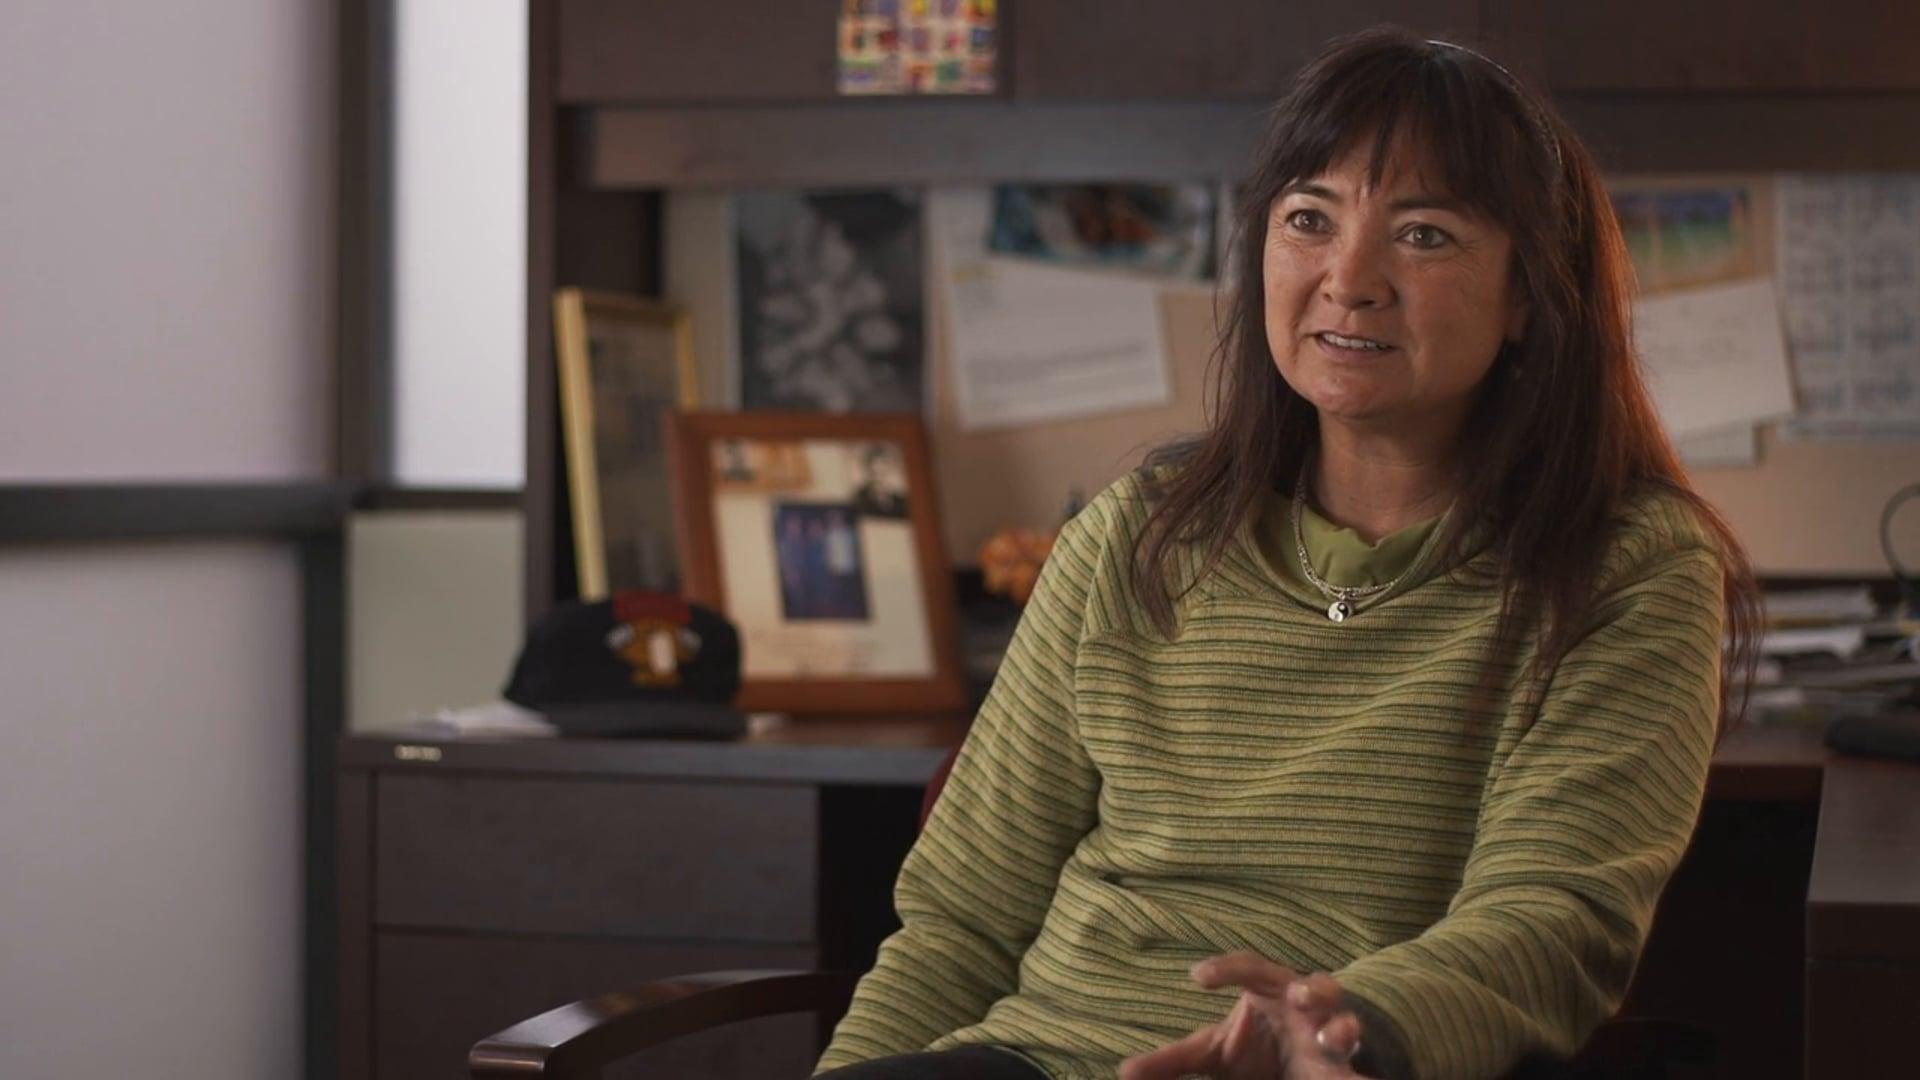 Psychologist Lori Daniels